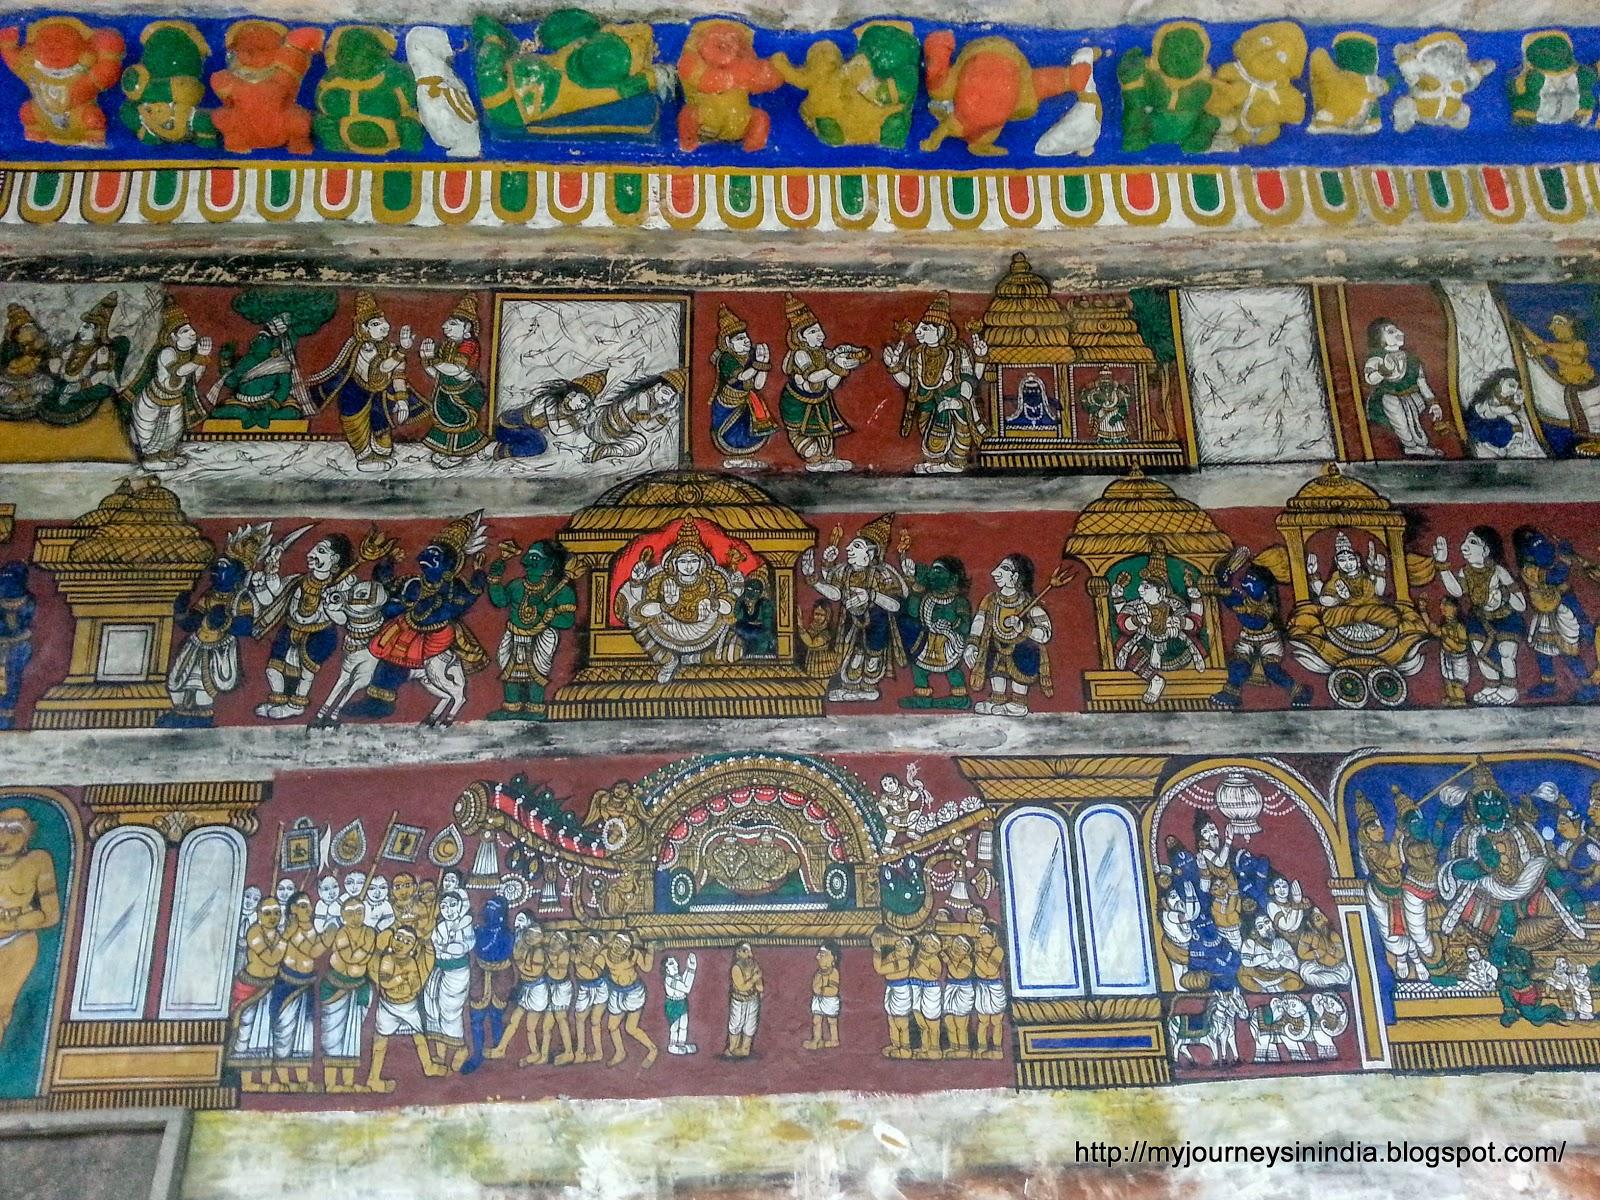 Tiruvaiyaru Aiyarappar Temple Murals